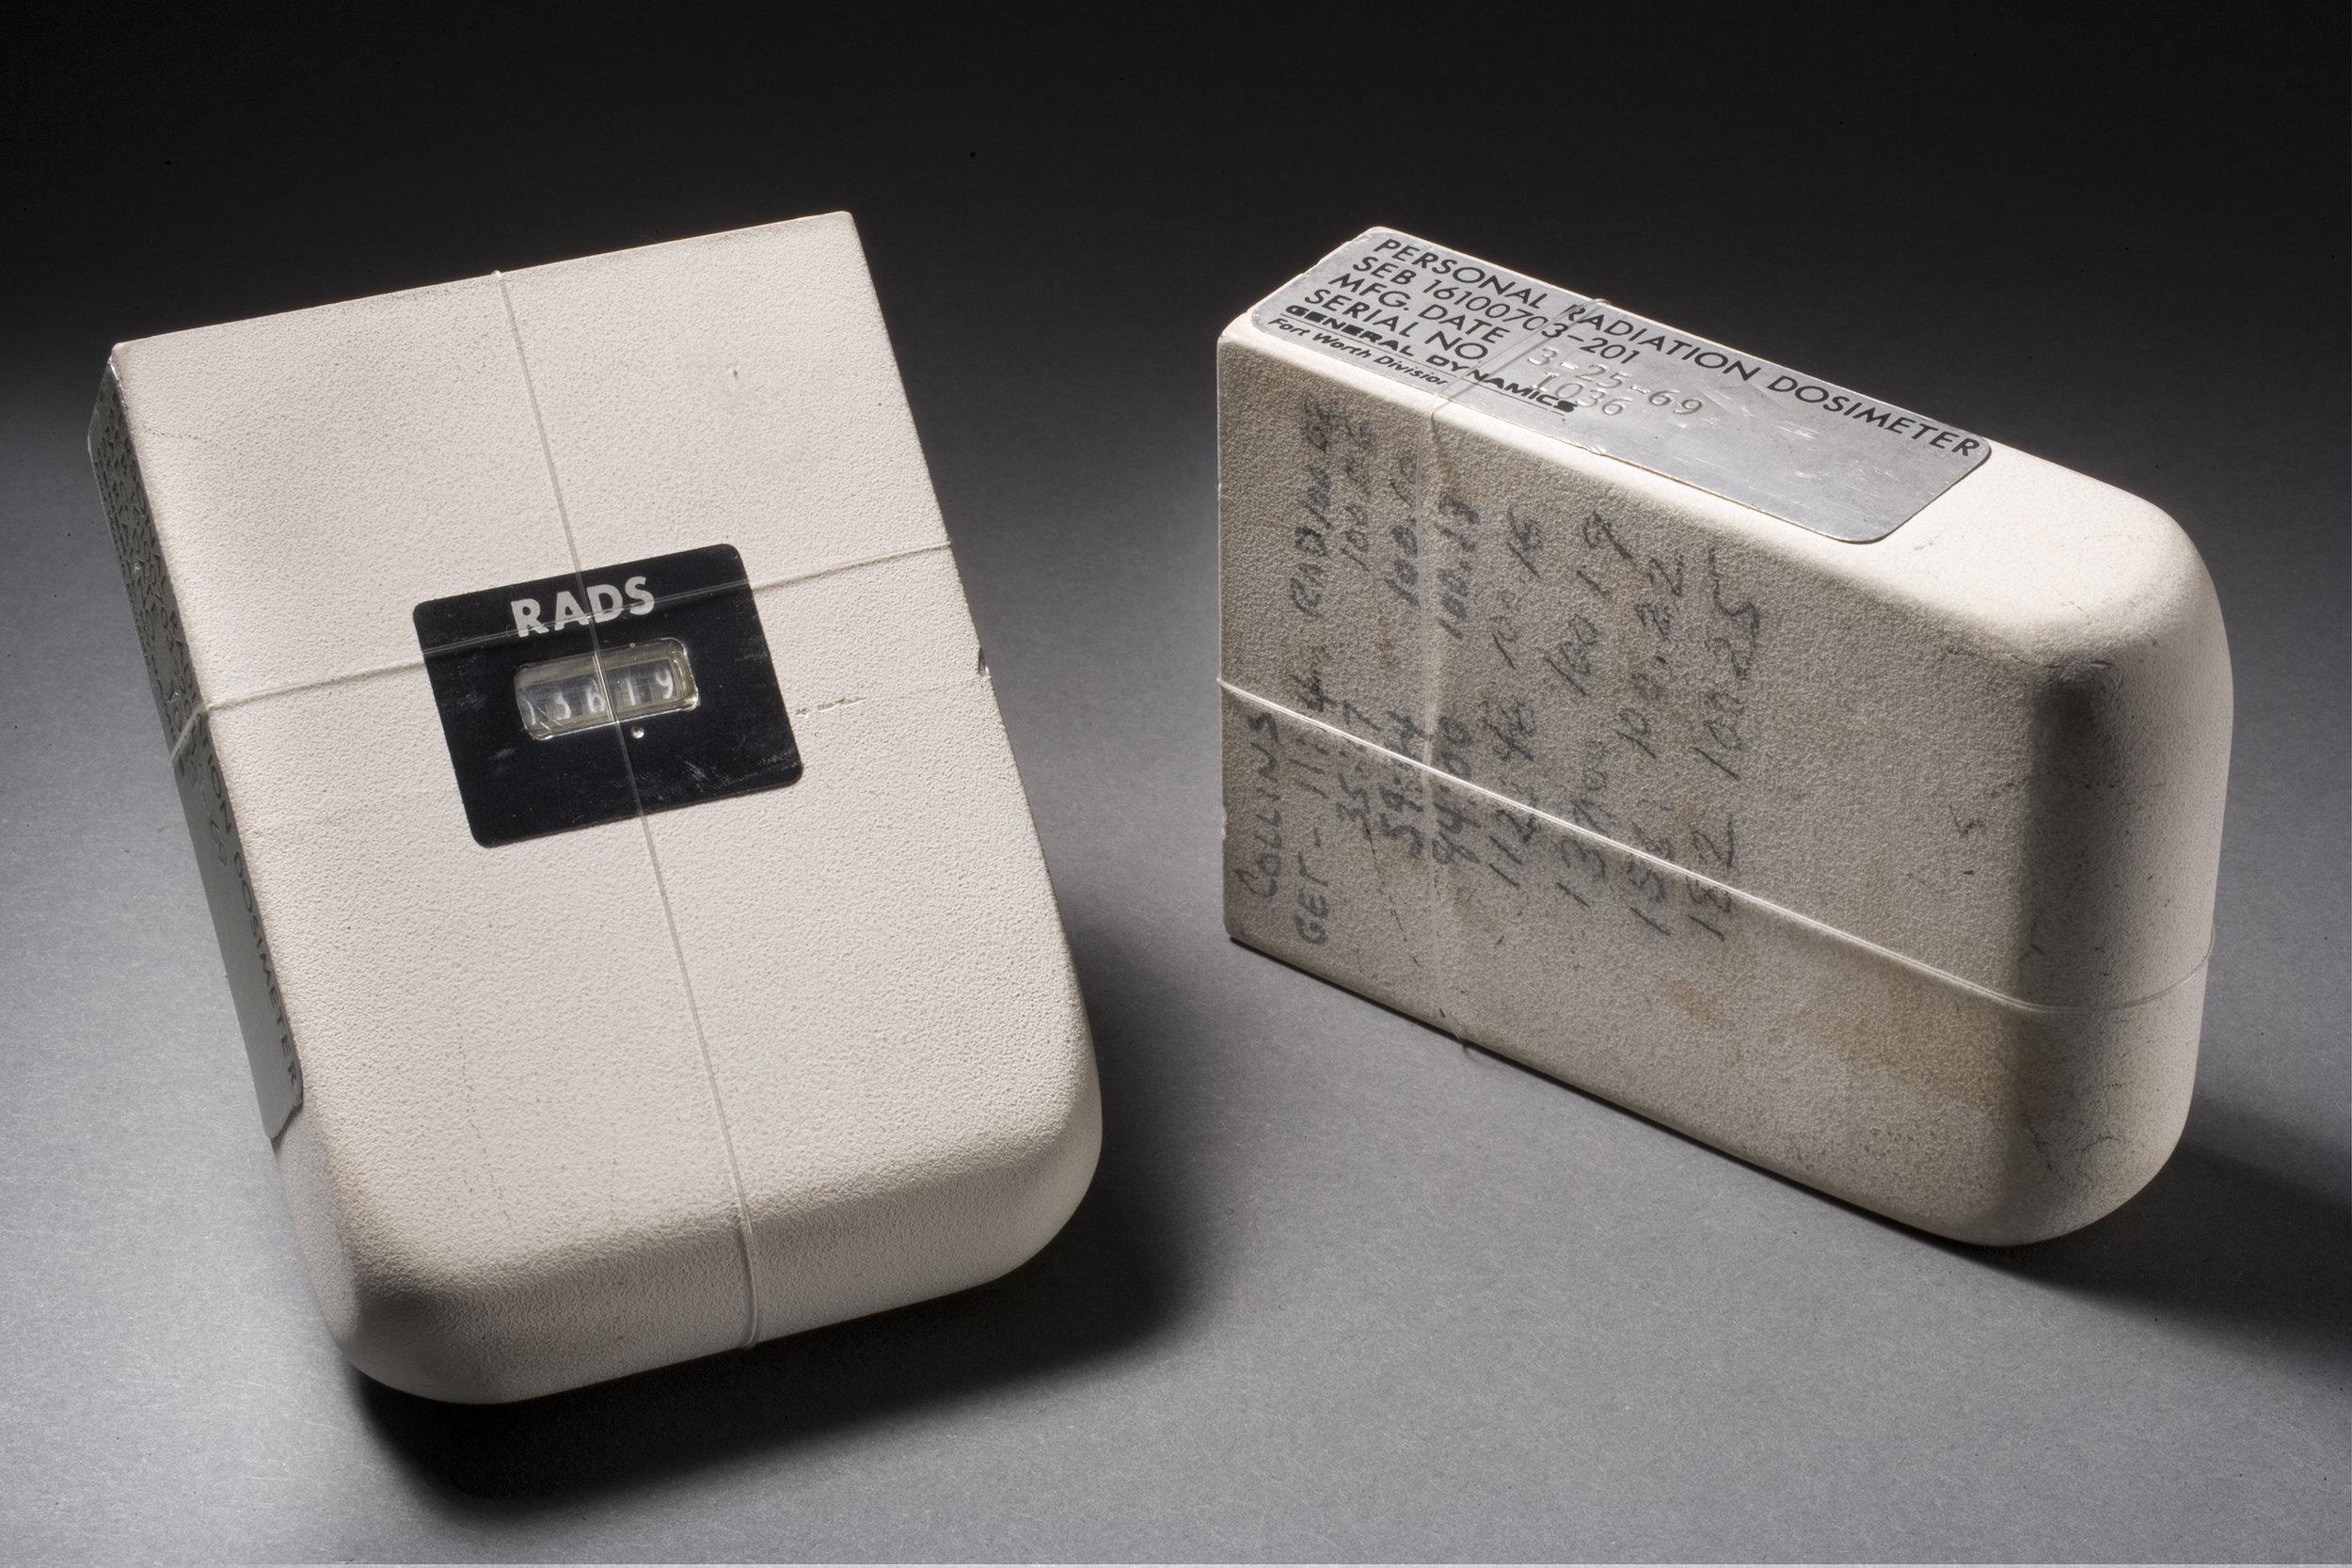 Personal Radiation Dosimeter (PRD) worn by Apollo astronauts